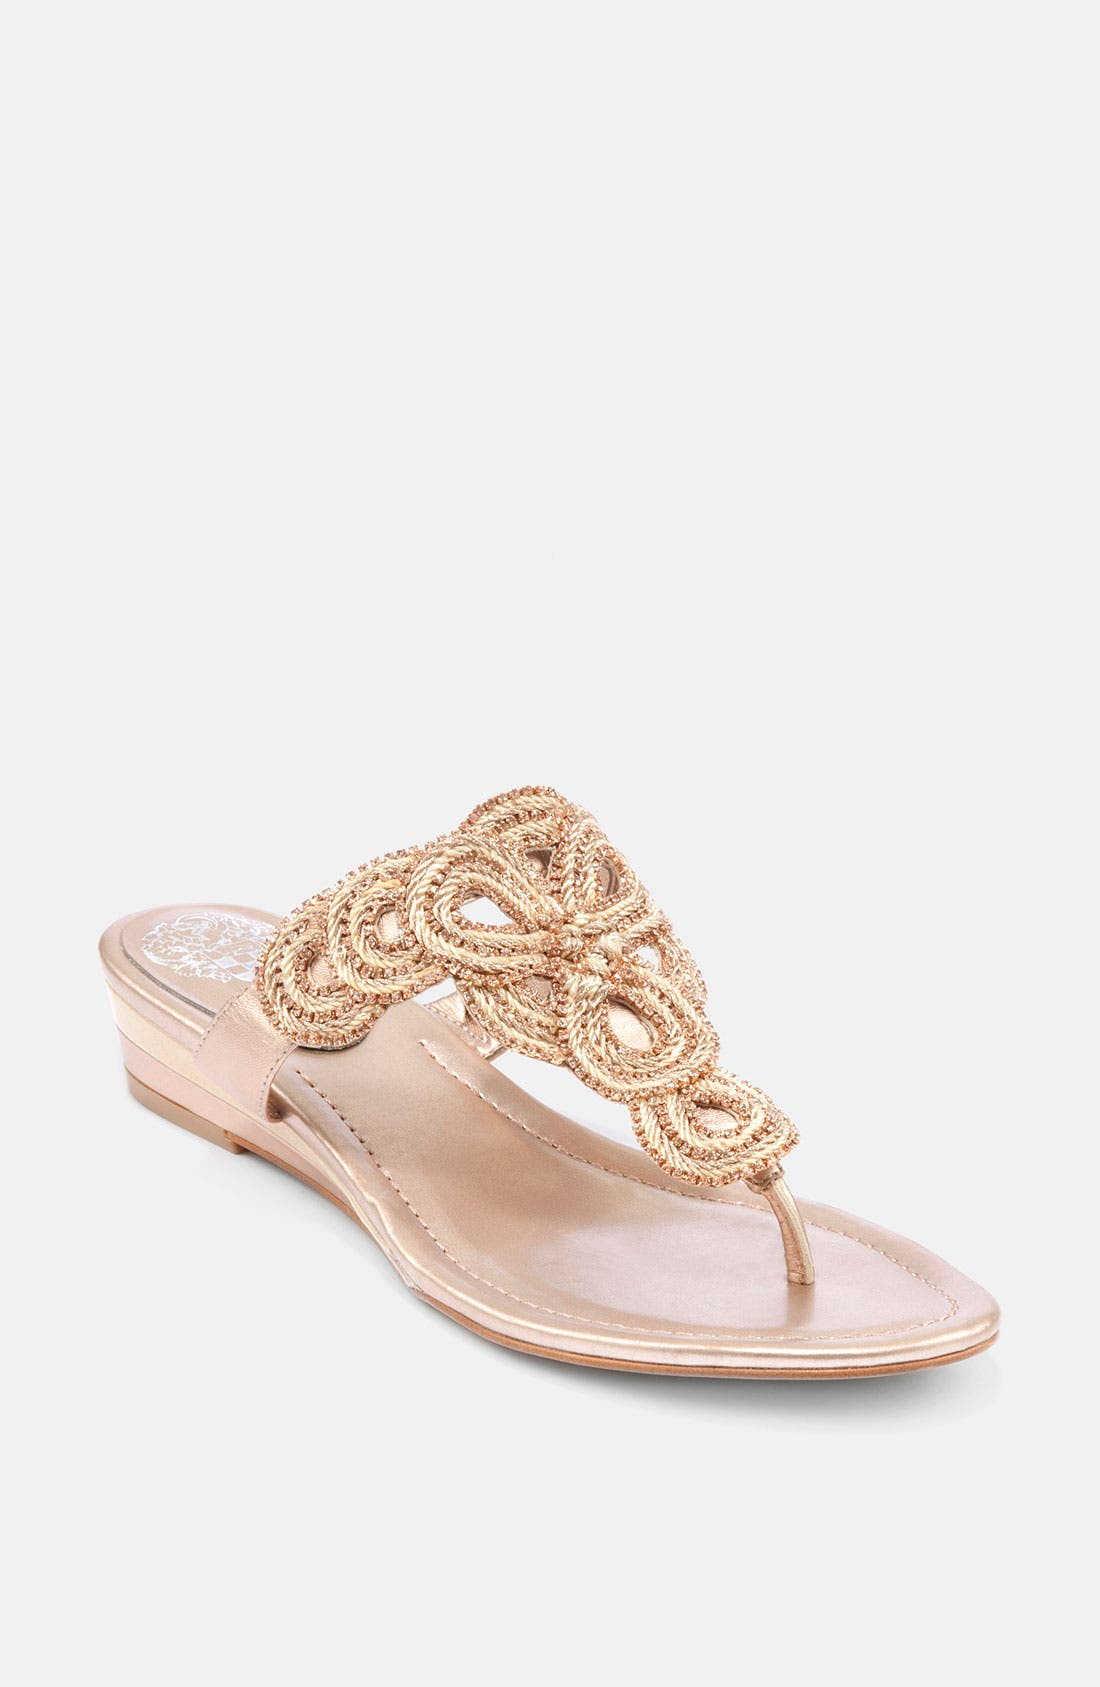 Alternate Image 1 Selected - Vince Camuto 'Idan' Sandal